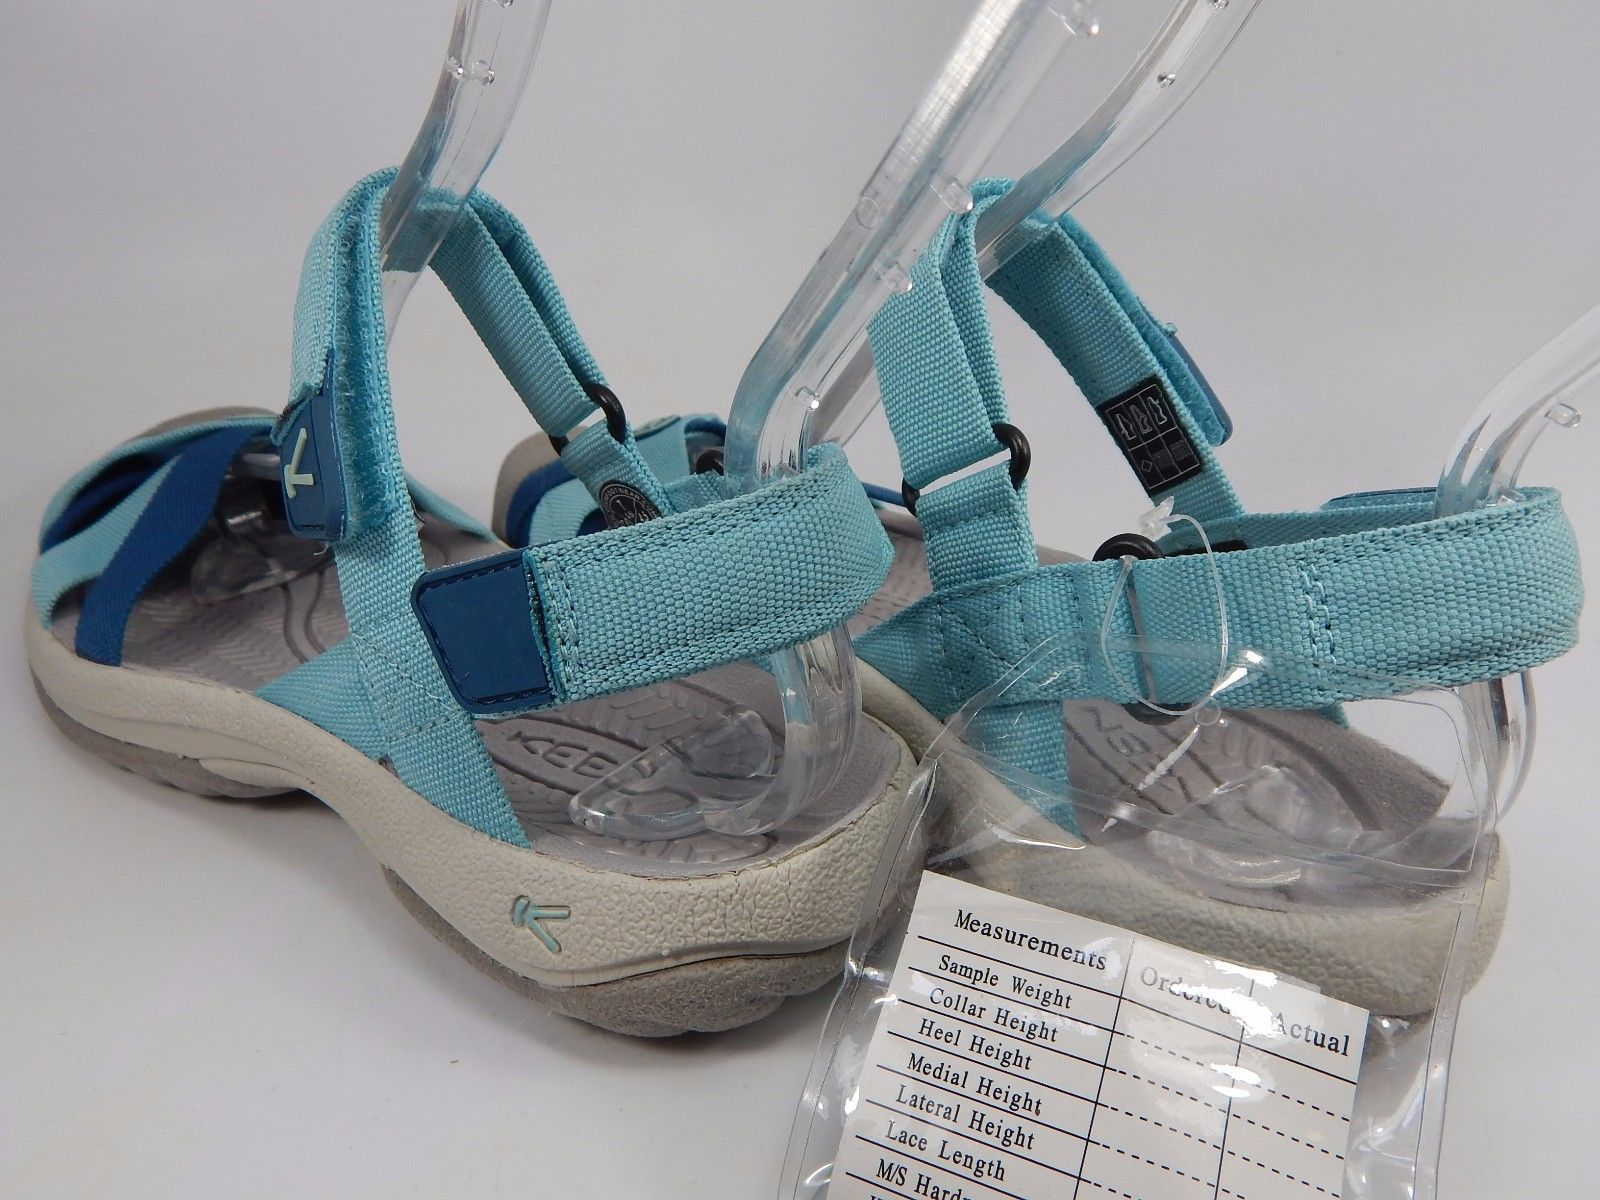 Keen Bali Strap Women's Sports Sandals Size US 7 M (B) EU 37.5 Aqua Sea Legion